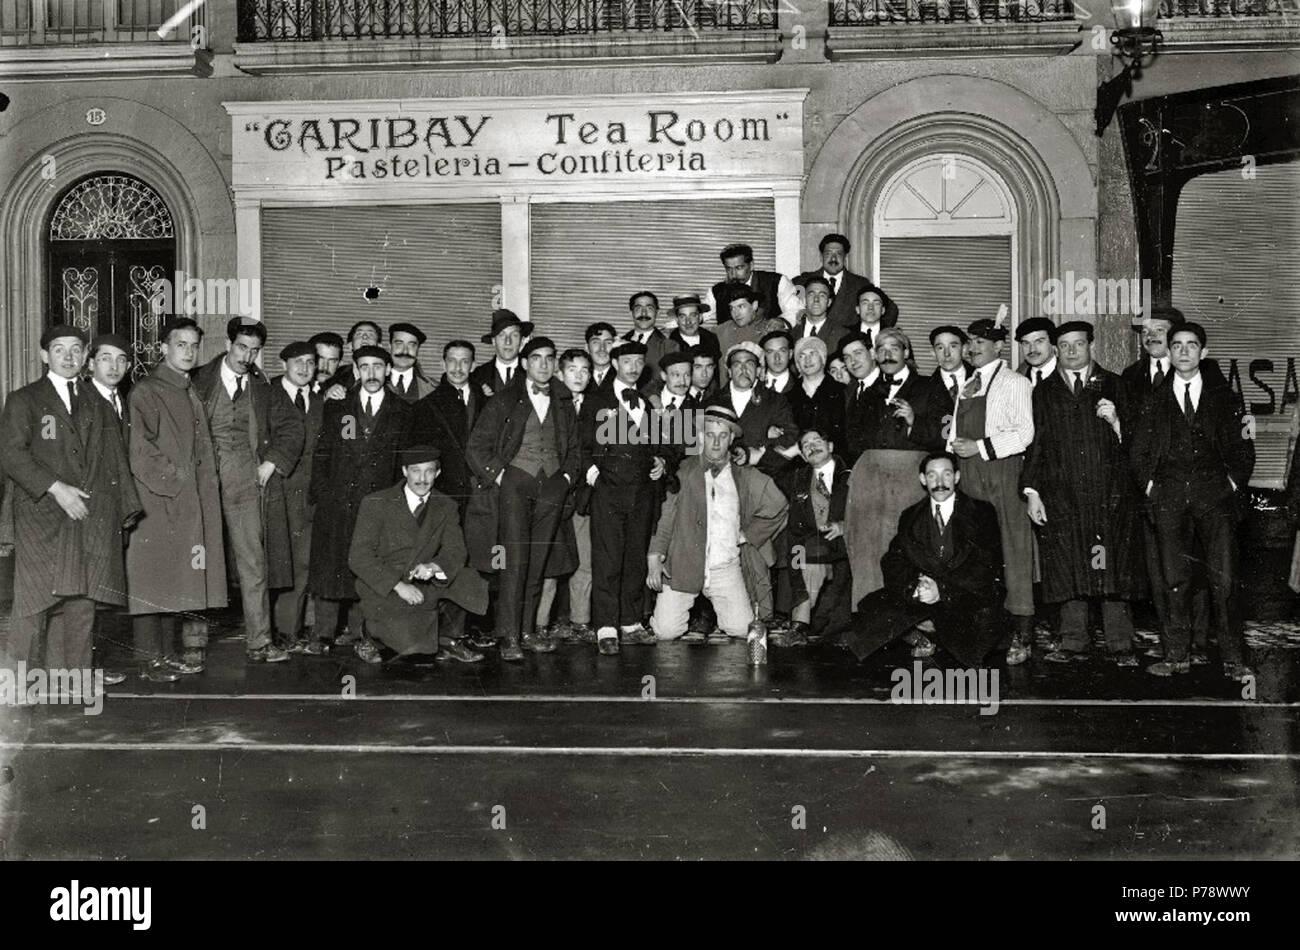 Español: Título original: Grupo de hombres delante de la pasteleria-confiteria 'Garibay Tea Room' (1/1) Localización: San Sebastián (Guipúzcoa)  . 1916 35 Grupo de hombres delante de la pasteleria-confiteria 'Garibay Tea Room' (1 de 1) - Fondo Car-Kutxa Fototeka - Stock Image